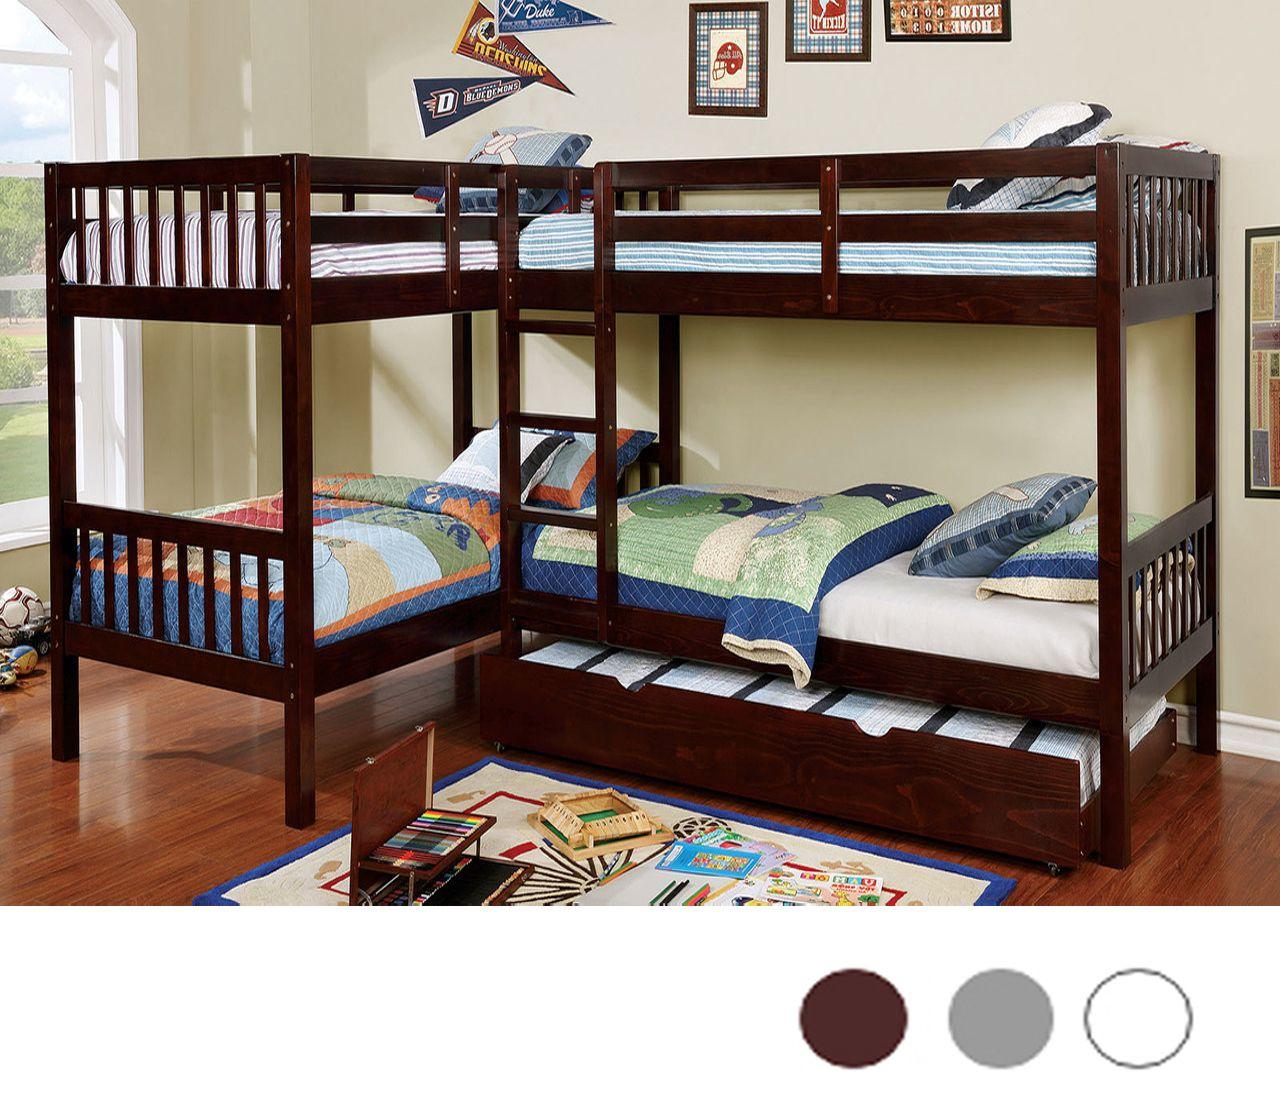 L Shaped Quadruple Wood Twin Bunk Bed in Dark Walnut (With